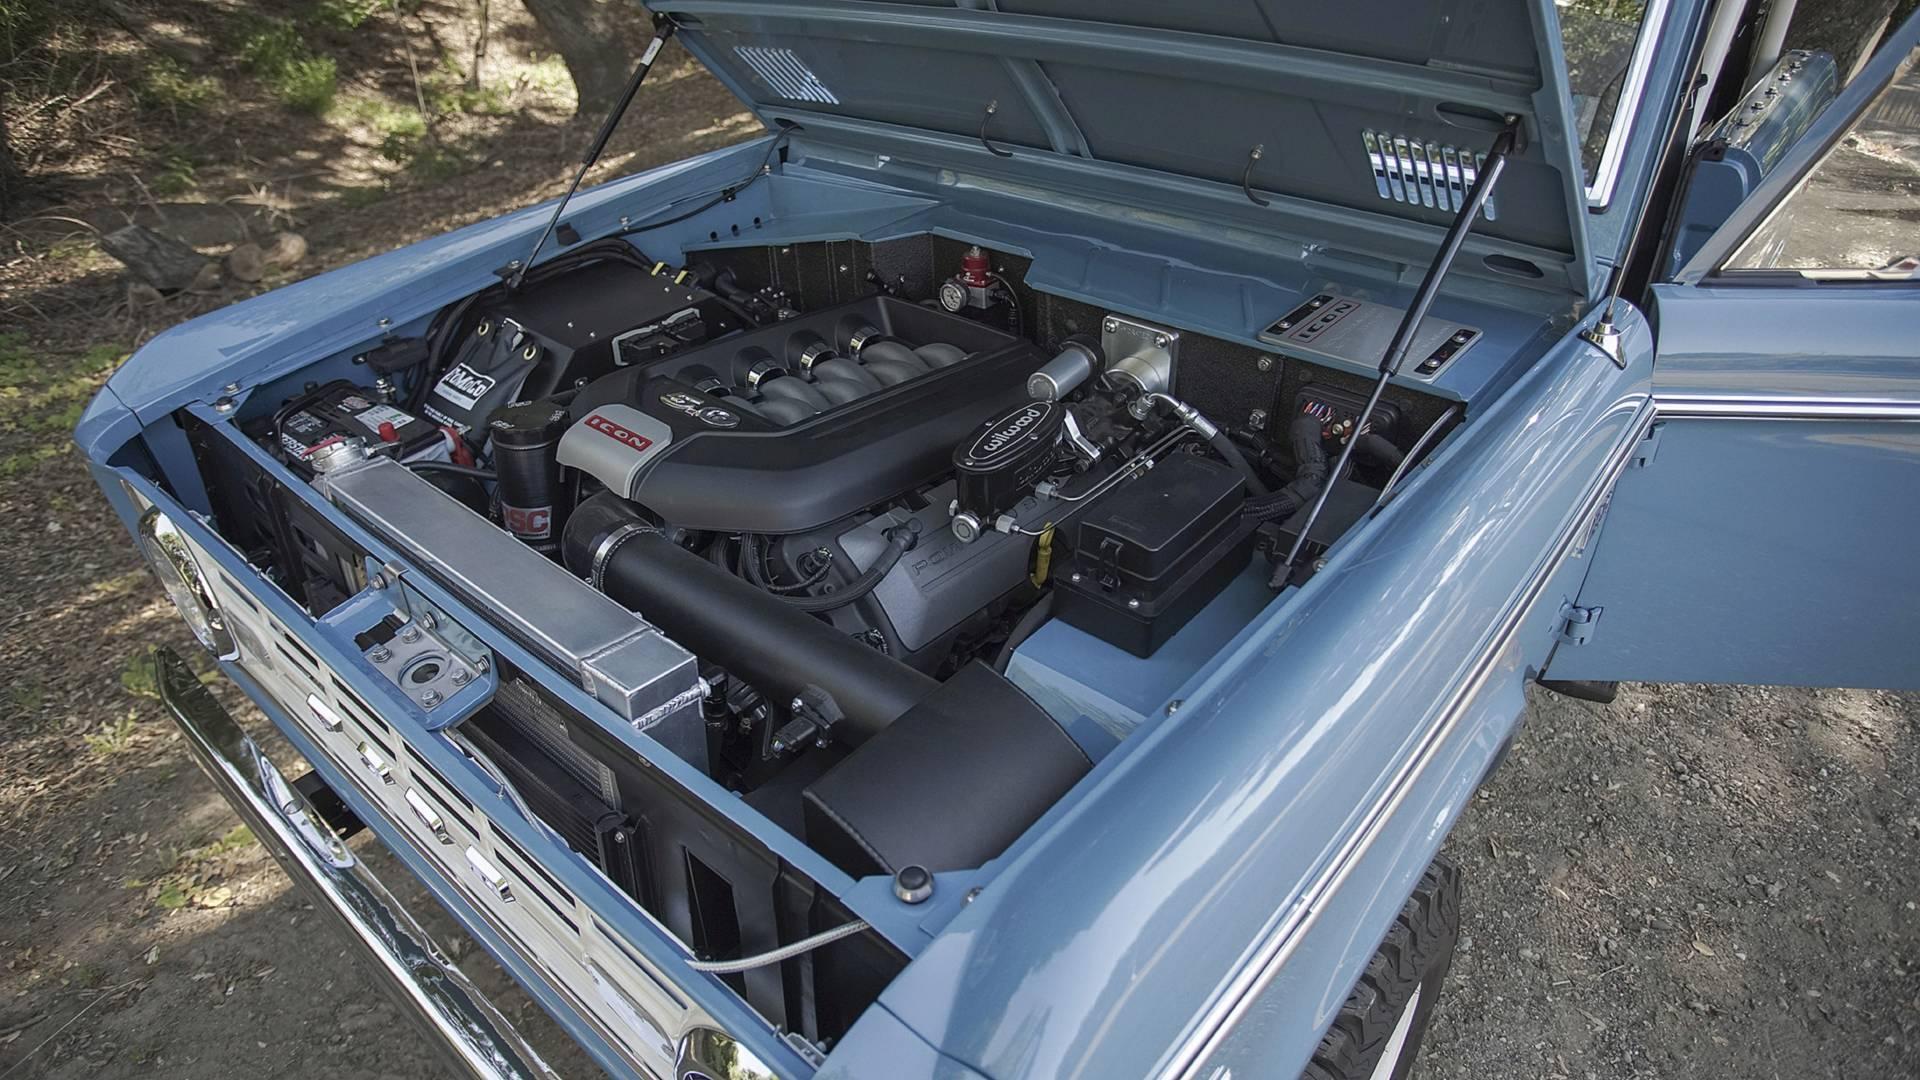 Icon Release 426 Horsepower Bucking Bronco